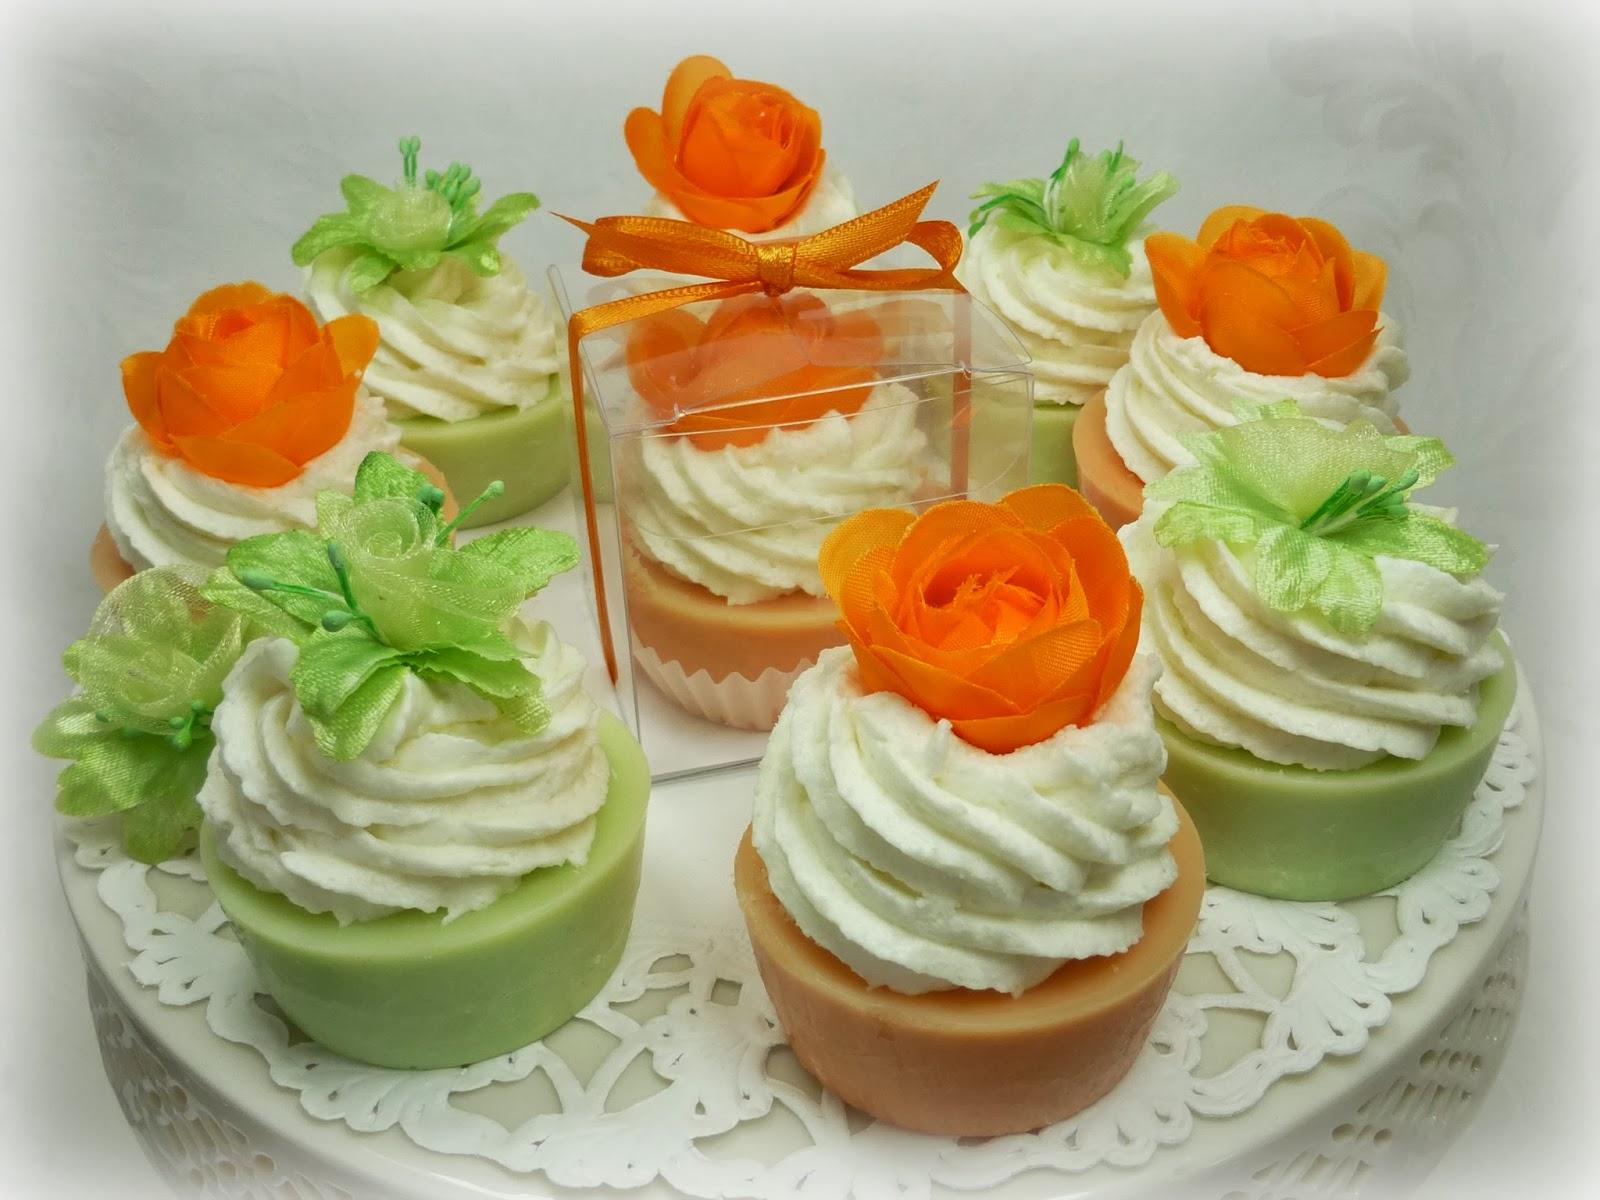 http://www.delicious-soaps.de/badekosmetik/badeconfiserie/index.php